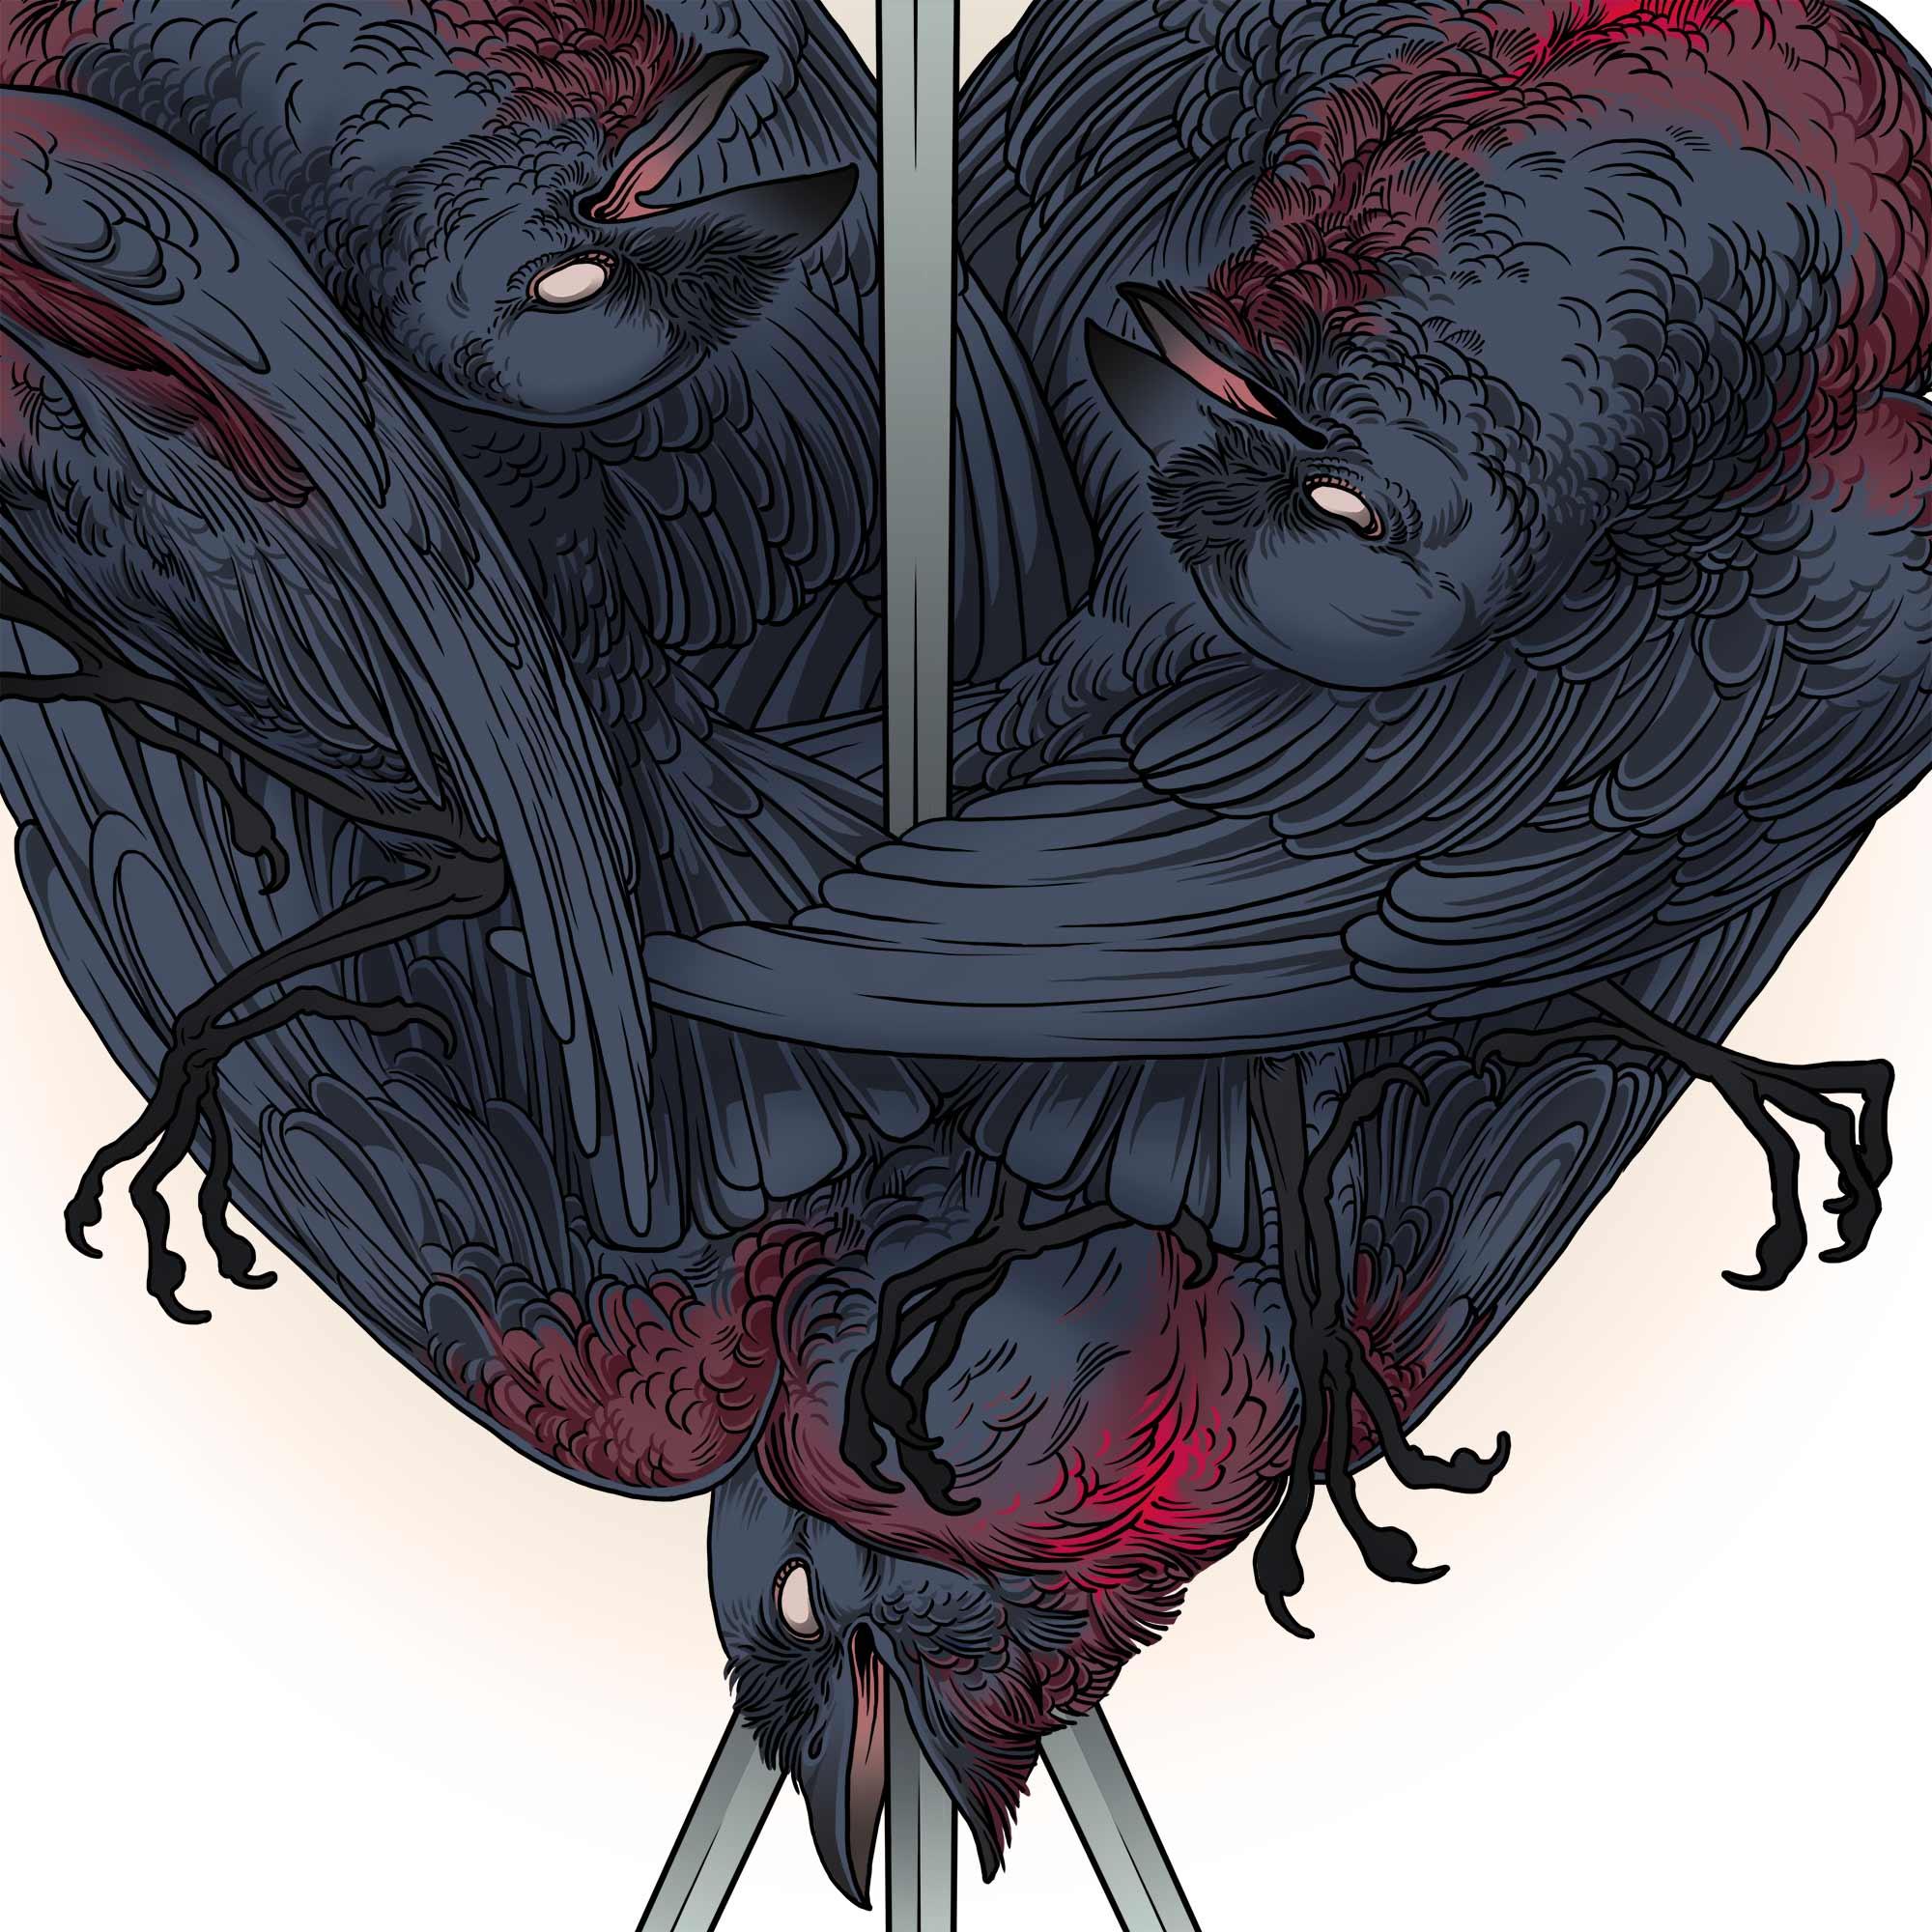 three-of-swords-emily-fundis.jpg